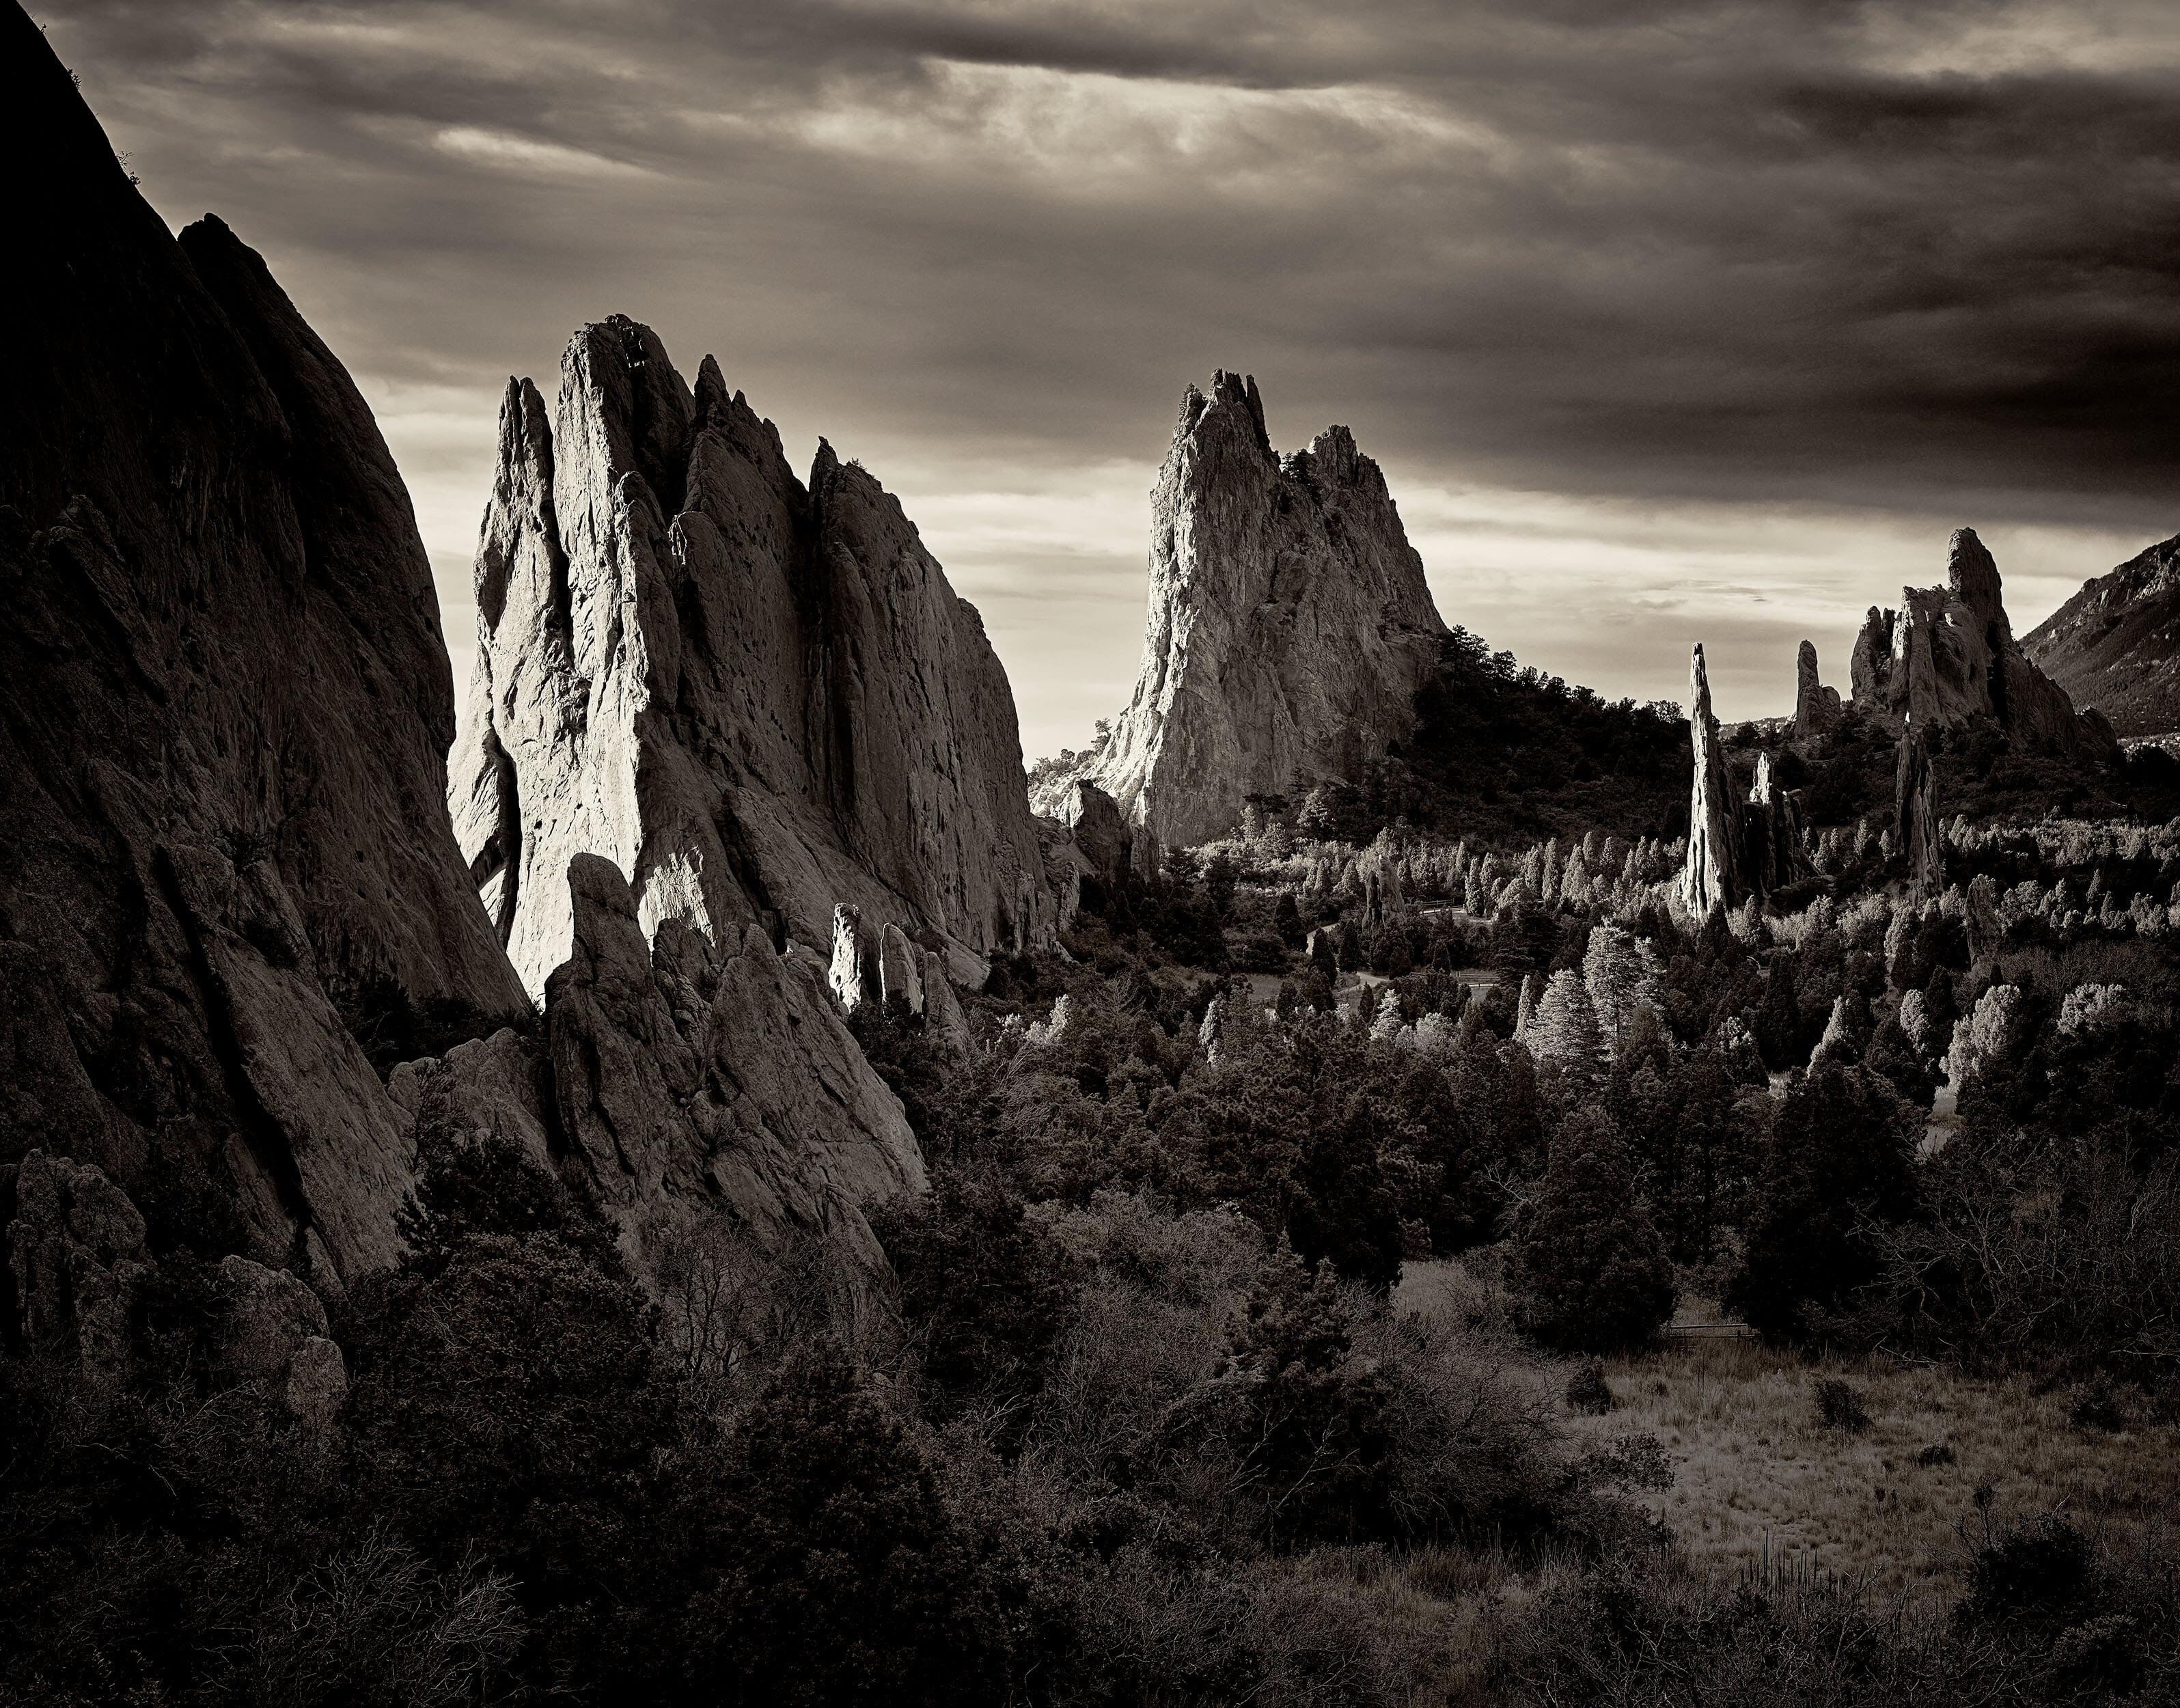 Gosling The Colorado Landscapes